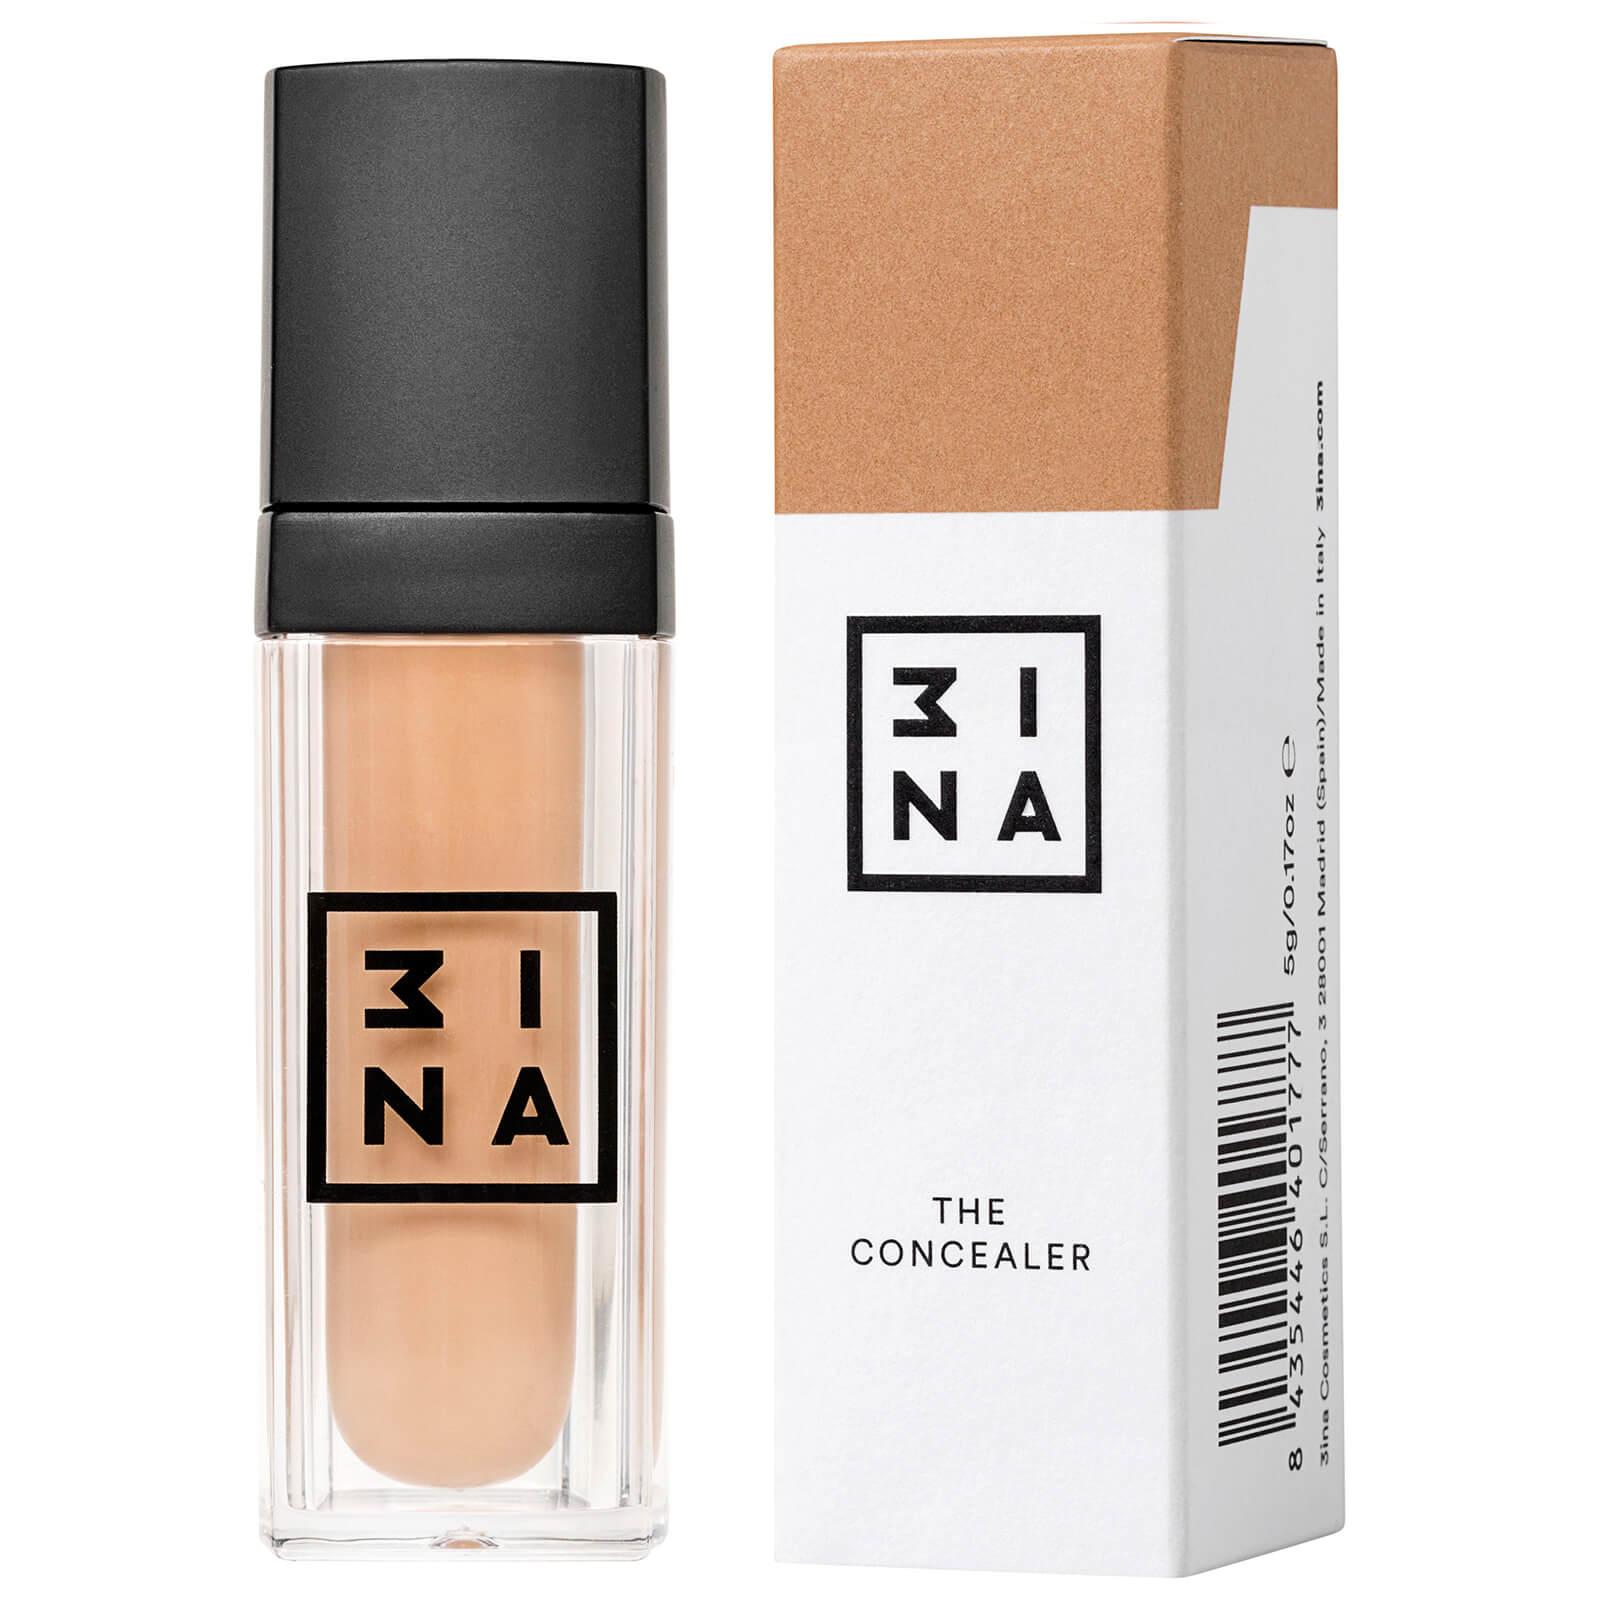 3INA Makeup correttore liquido 5 g (varie tonalità) - 103